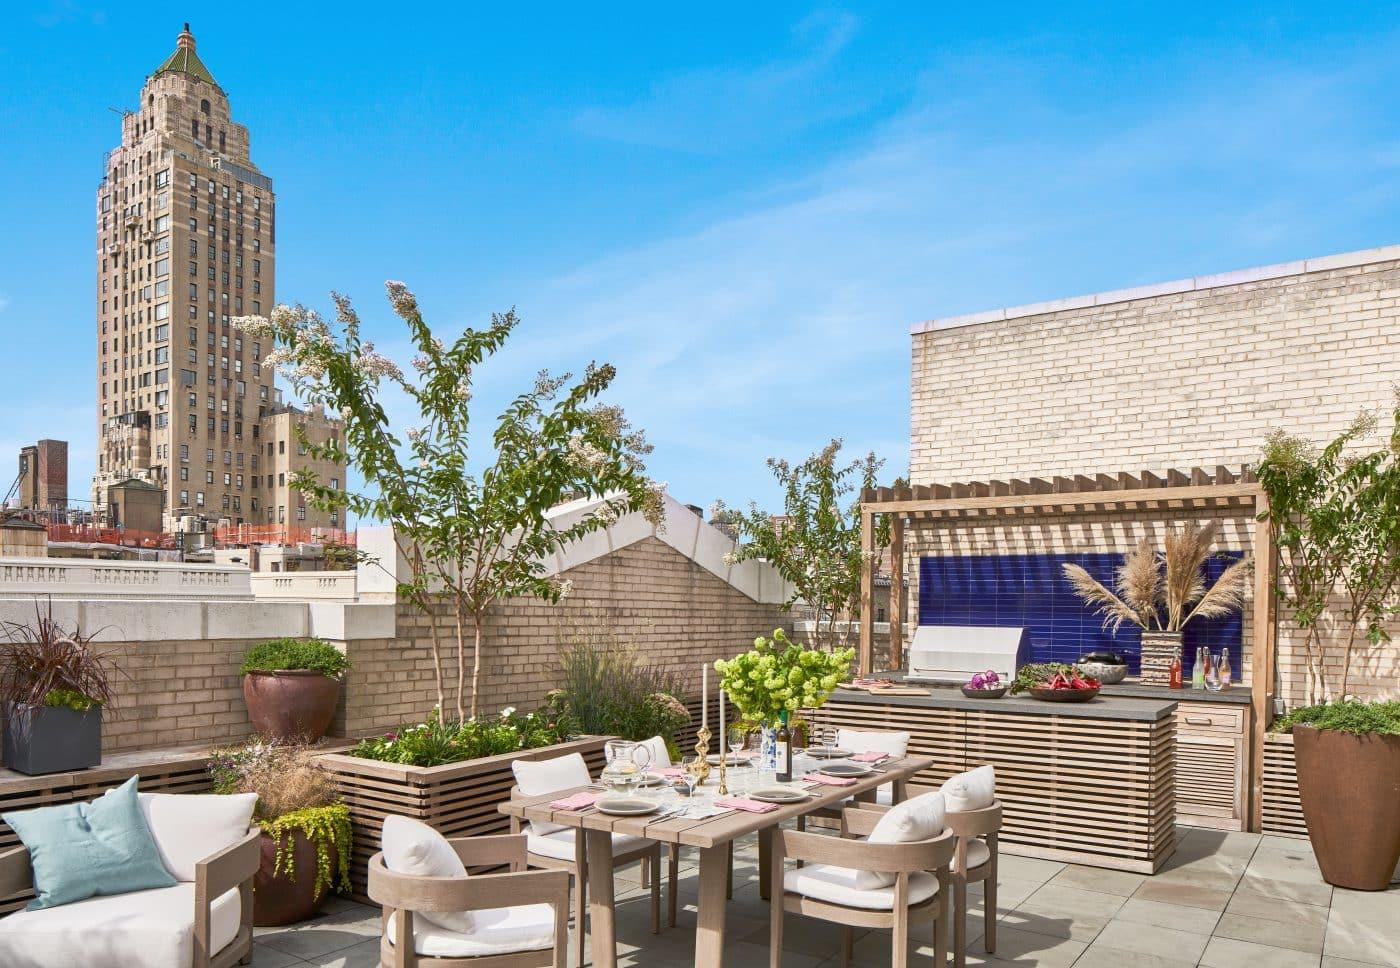 Wesley Moon Park Avenue entertaining terrace